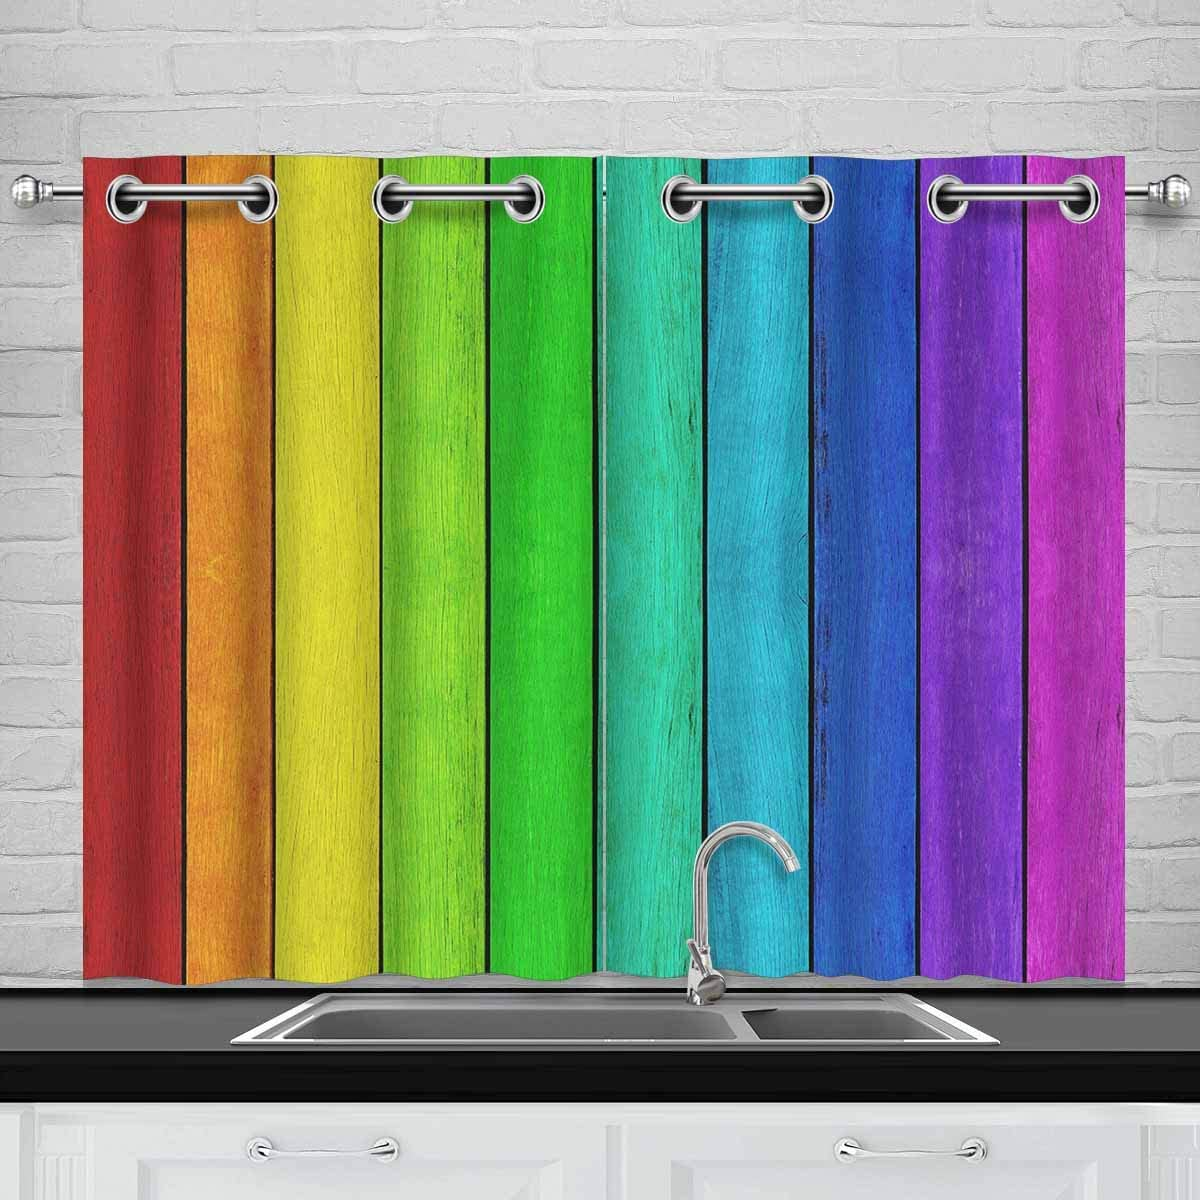 InterestPrint Empty Rainbow Colored Wood Background Blackout Window Curtain Panels Darkening Window Curtain for Living Room Bedroom, 30W x 45L, 2 Panels